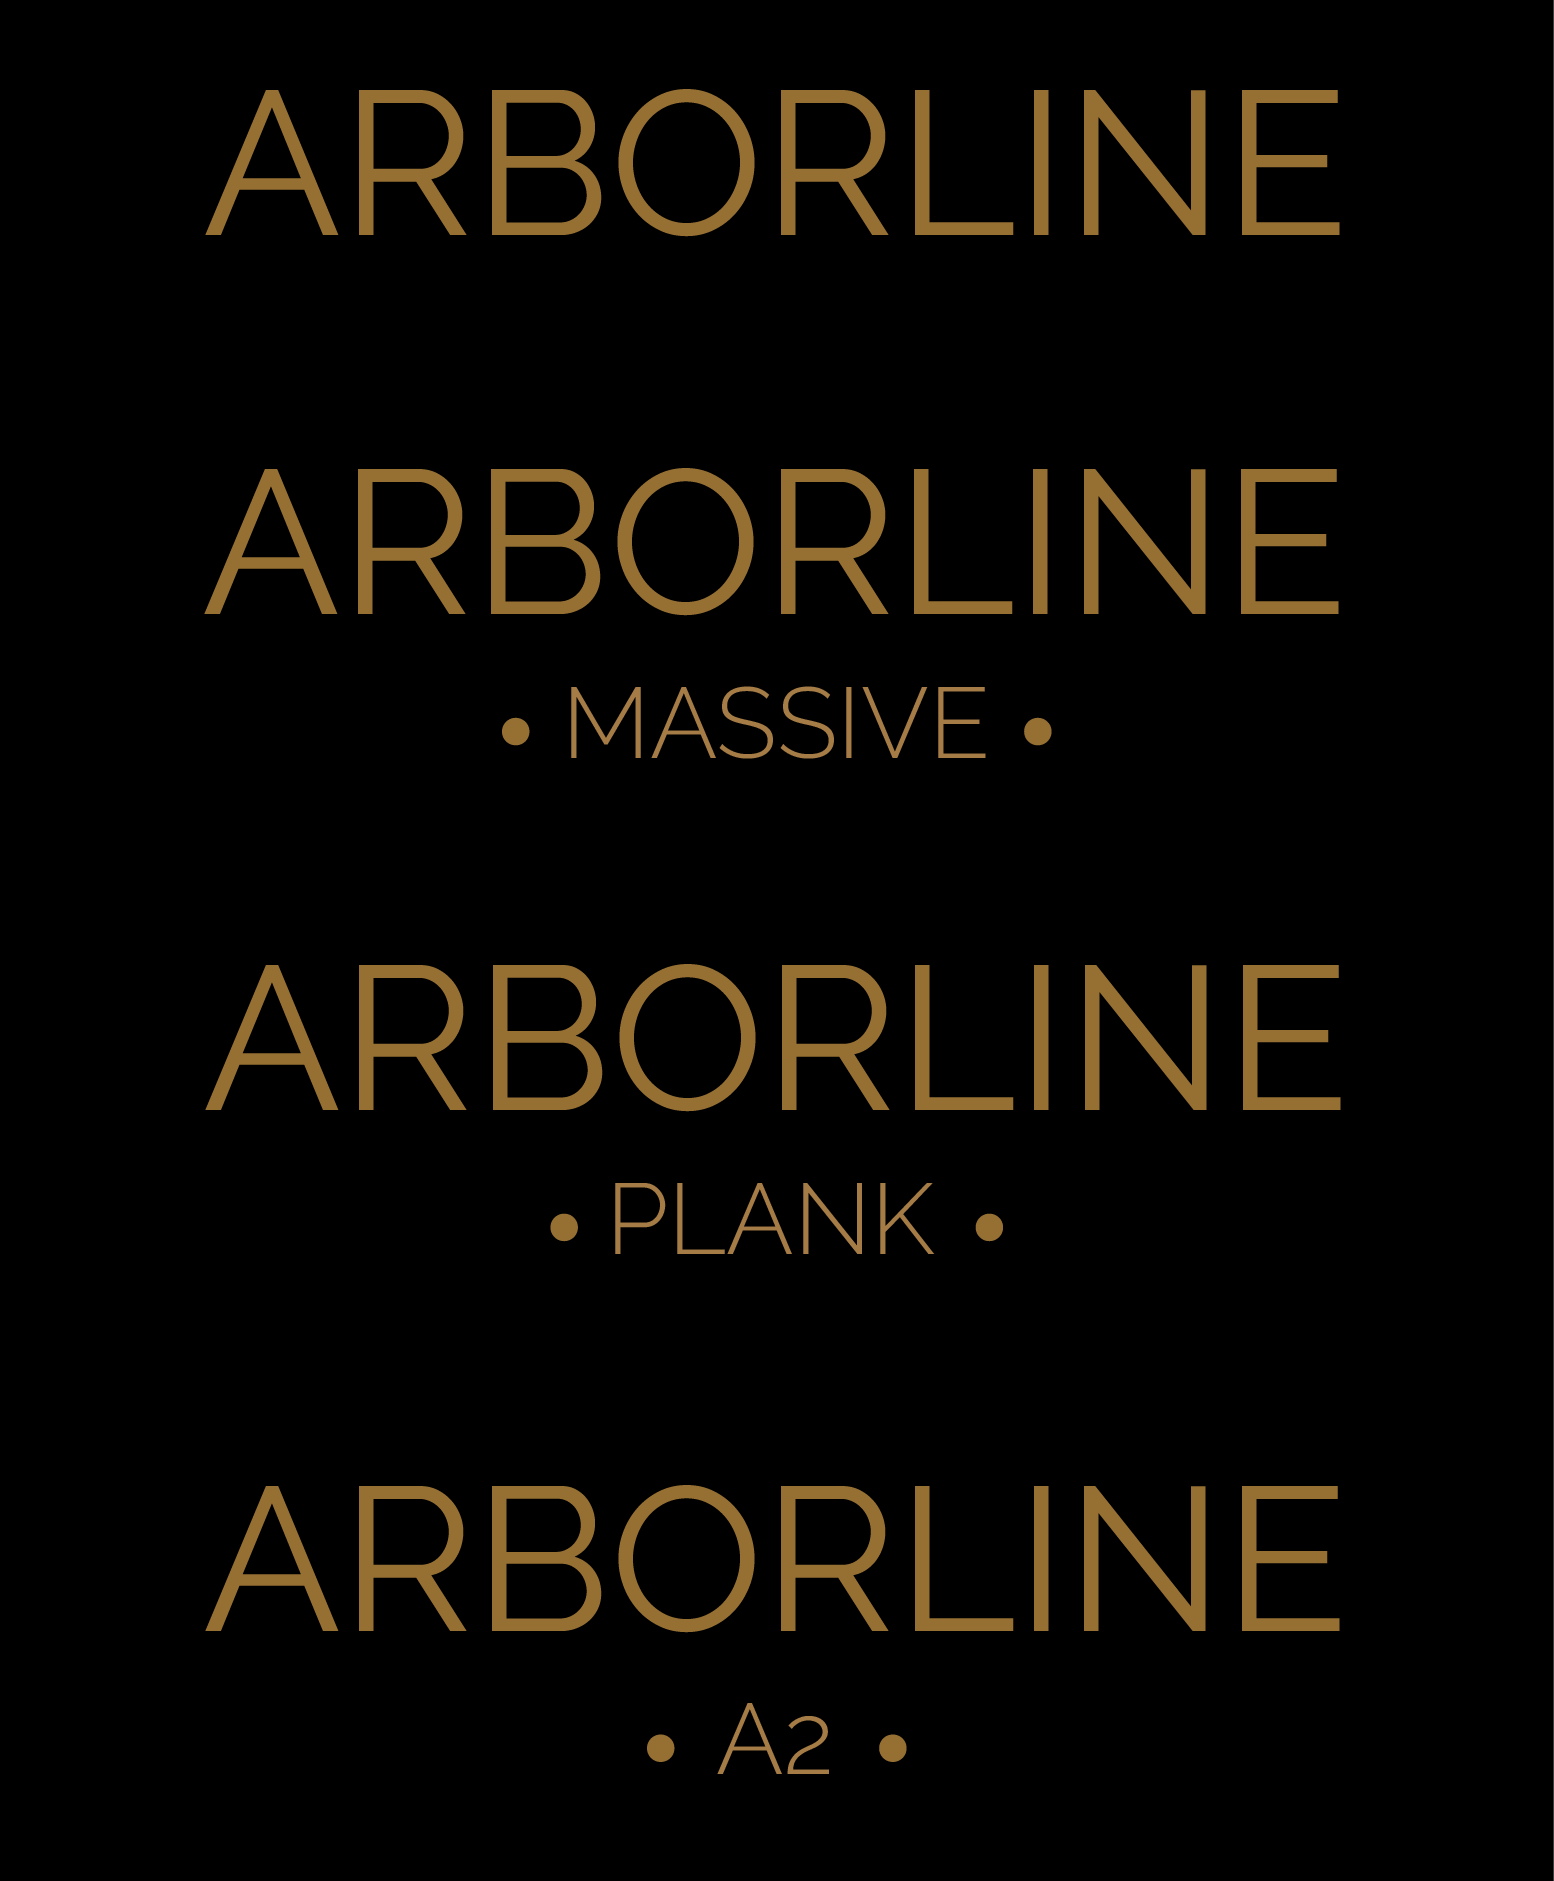 arborline.png